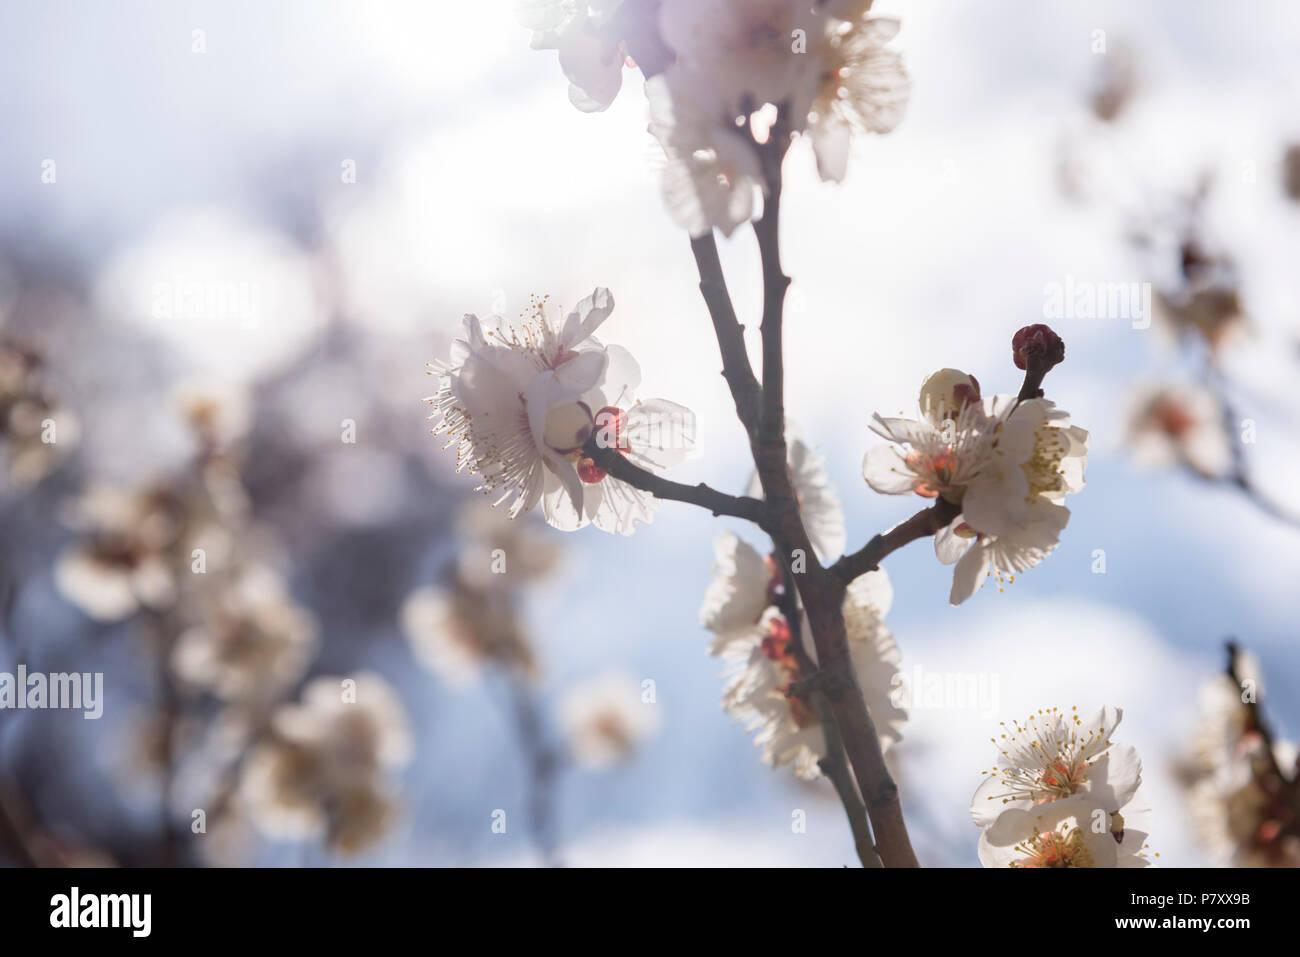 Weiße Blüten Cherry Plum tree, selektiver Fokus, Japan Blume, Beauty, Spa-Konzept Stockbild